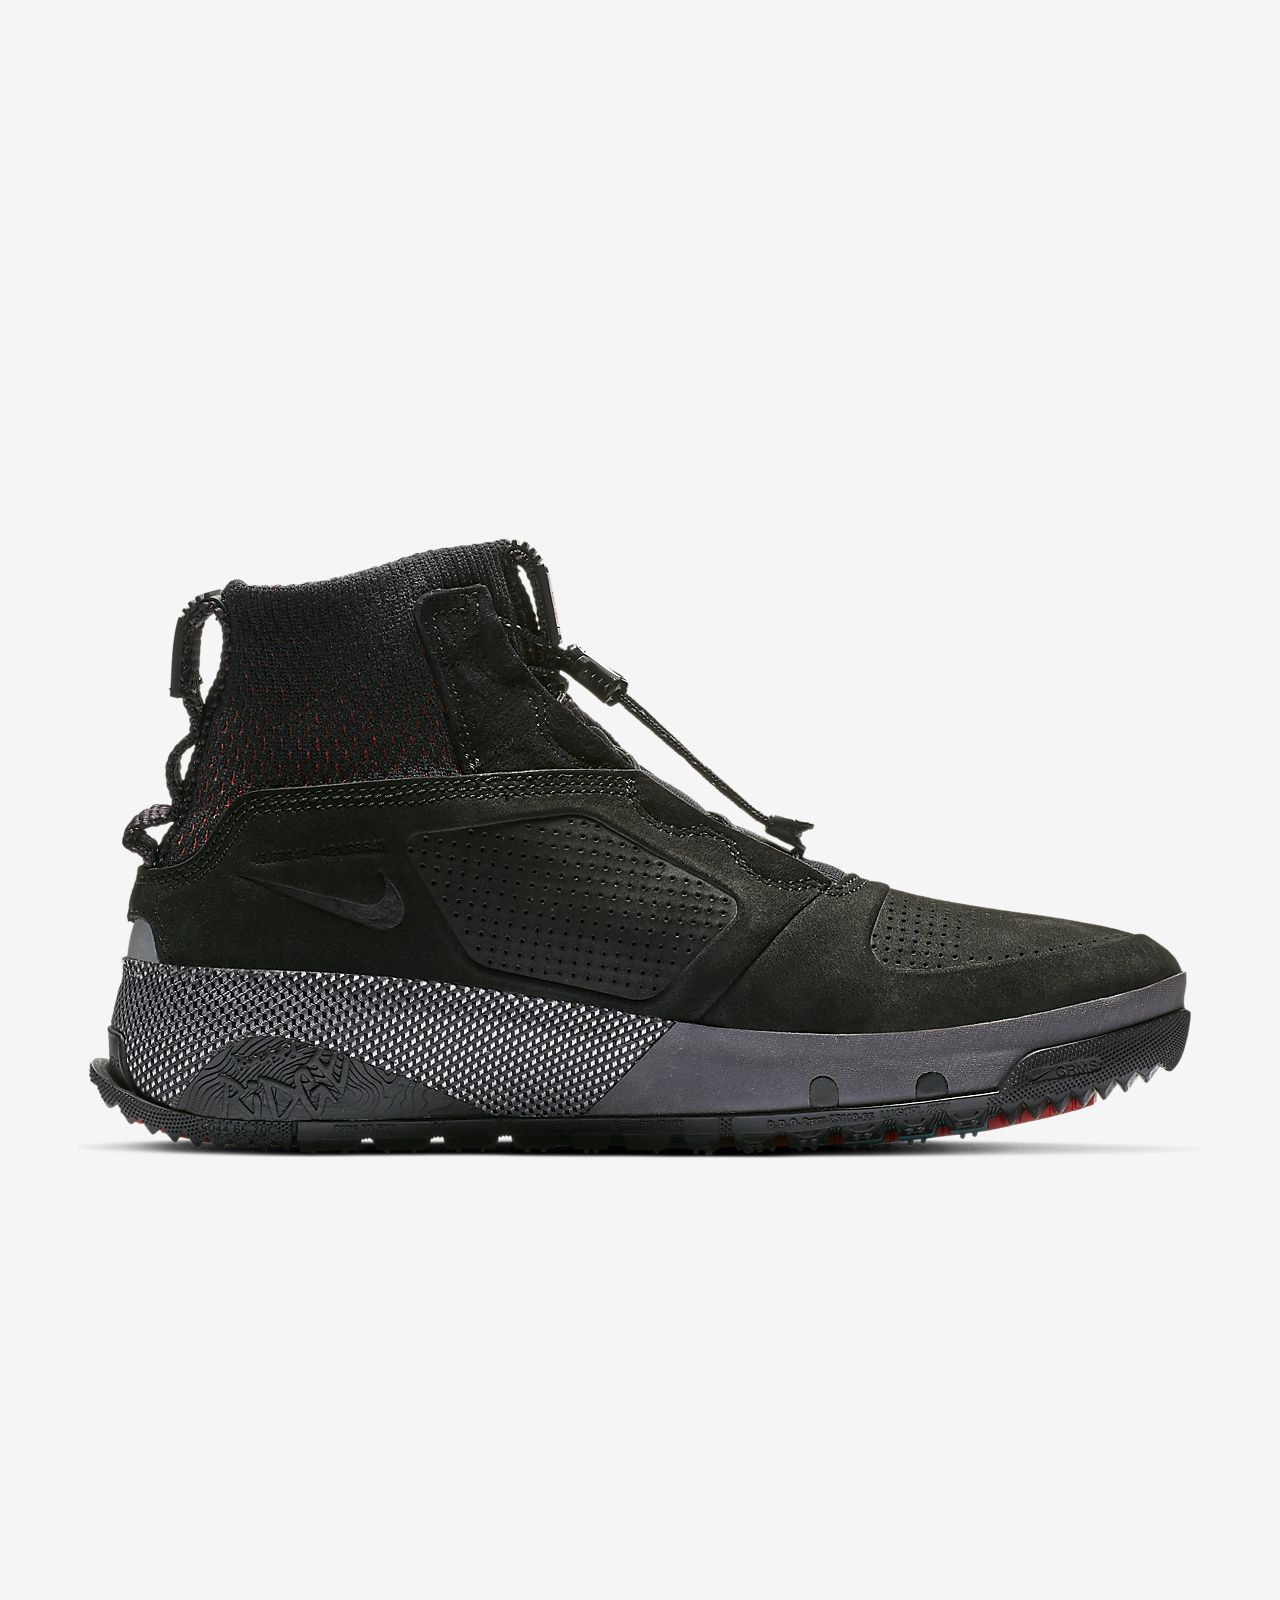 new product 91b35 4e543 ... Sko Nike ACG Ruckle Ridge för män